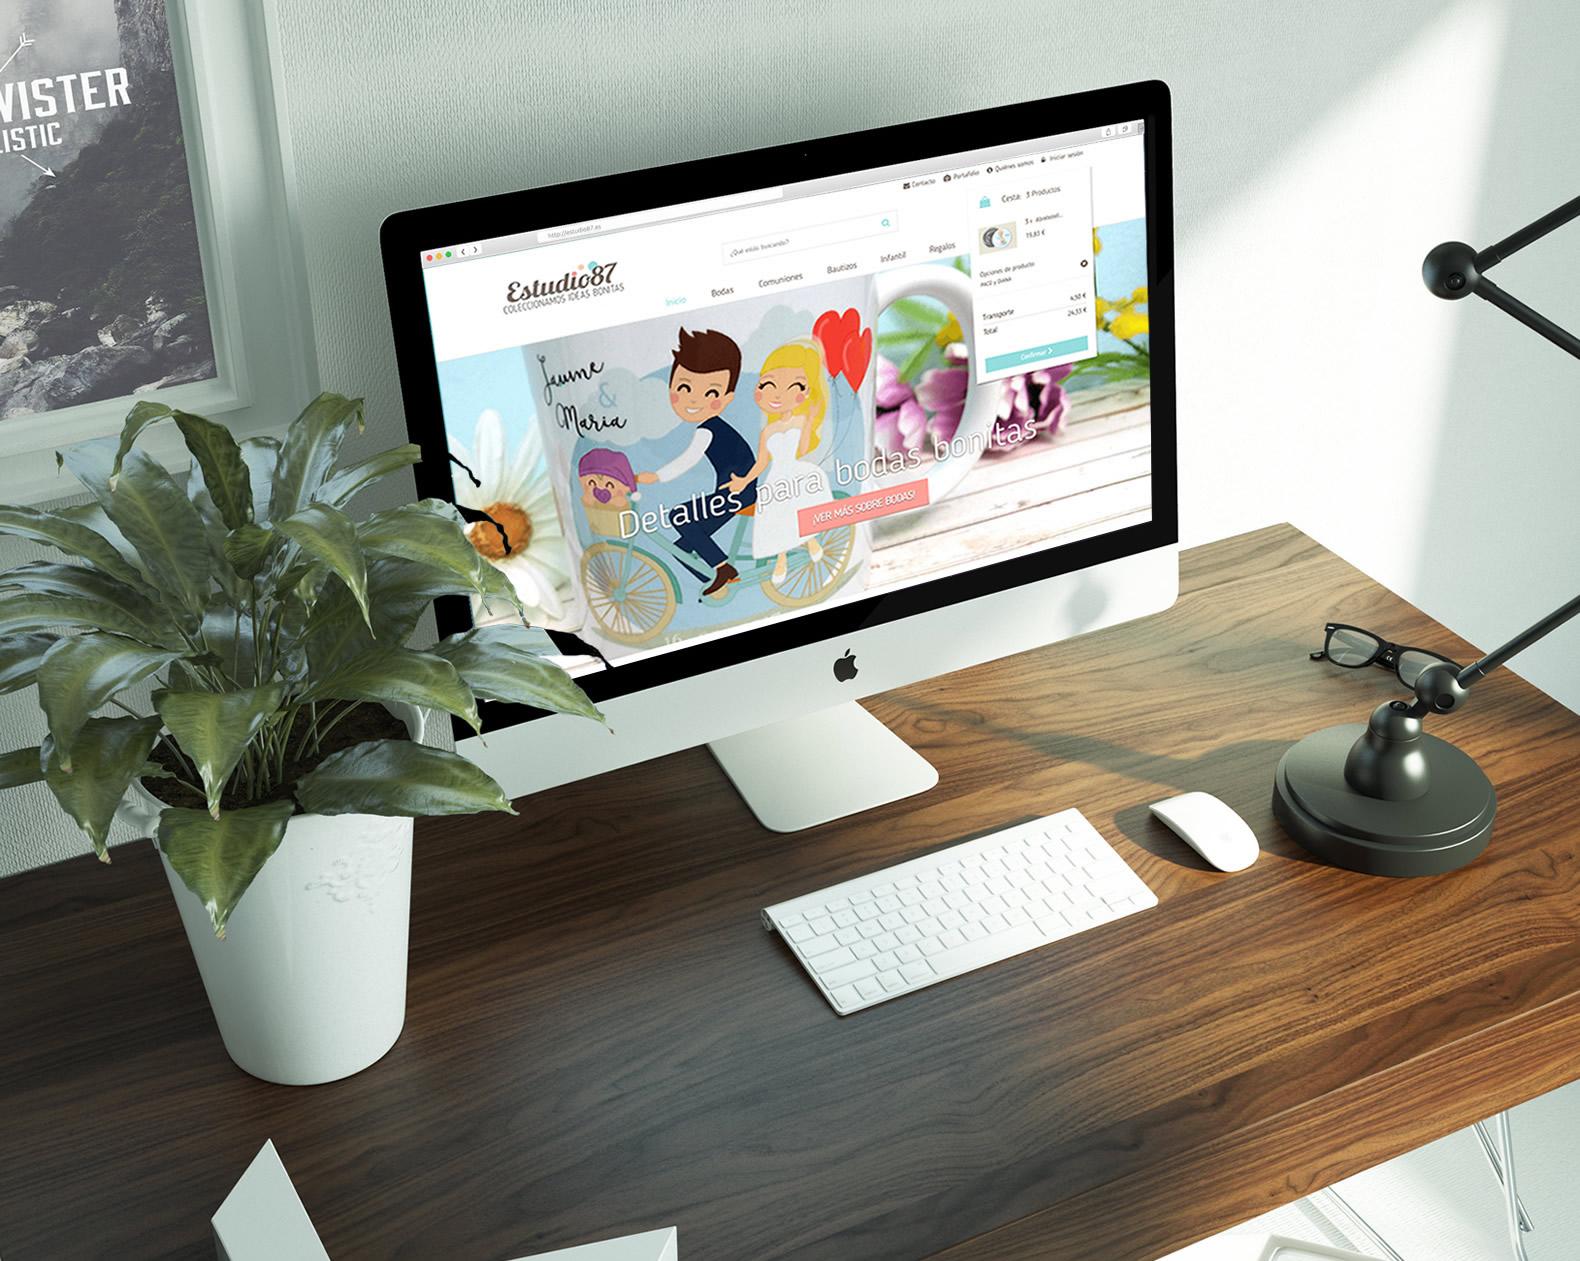 Estudio 87 - Creación de Sitios Web